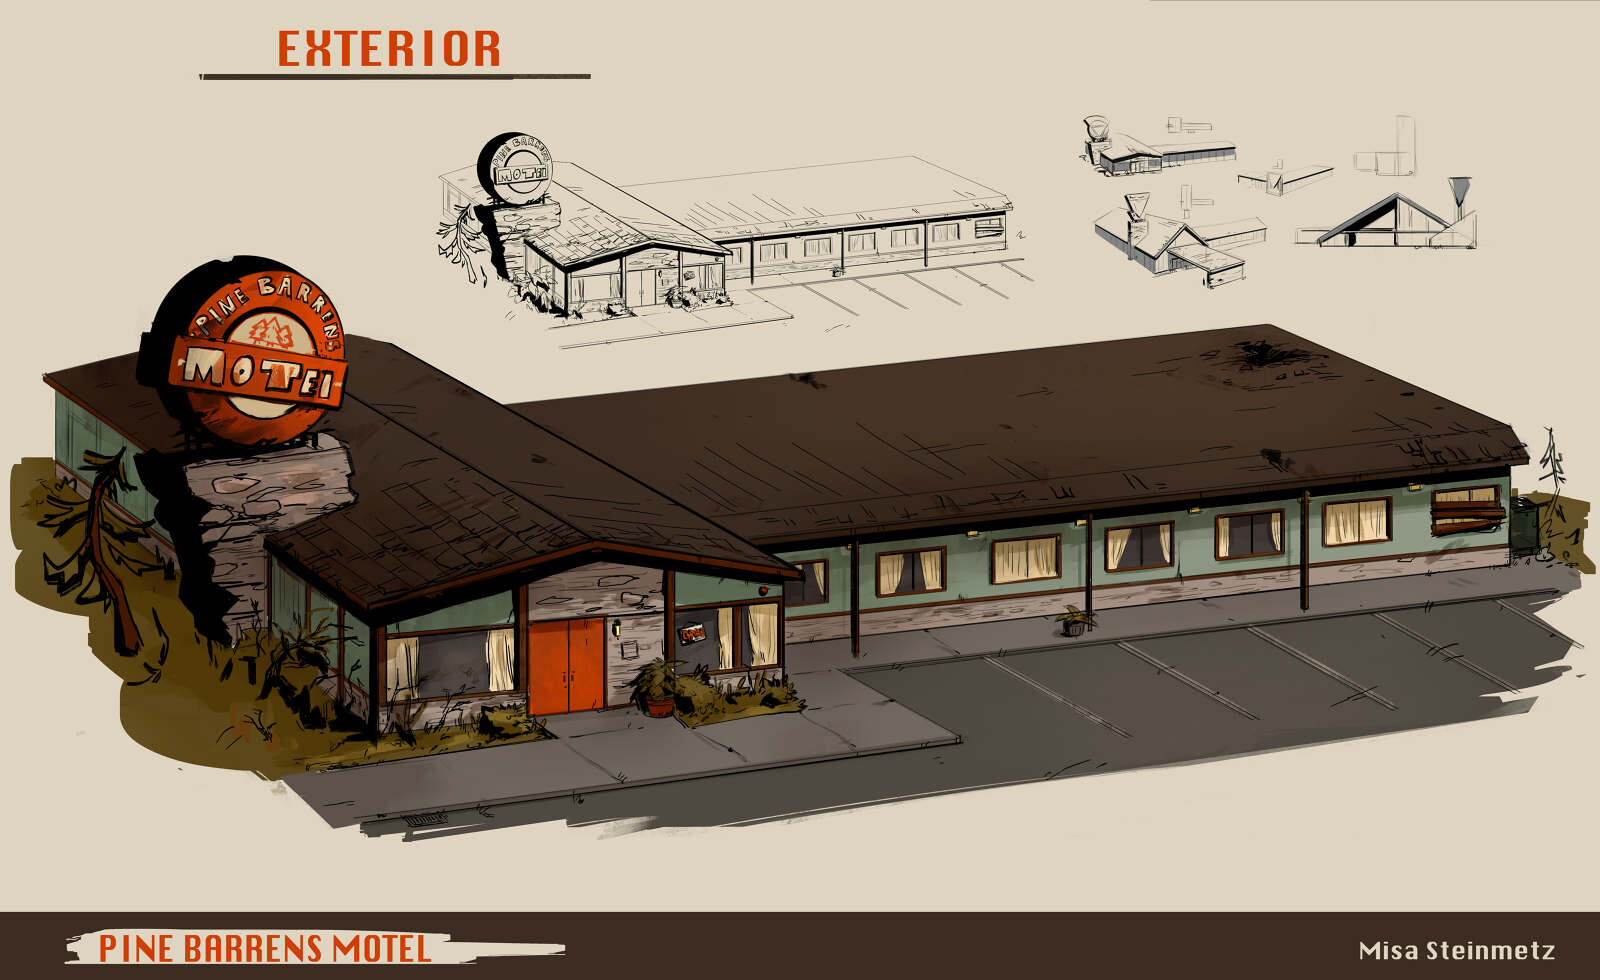 Pine Barrens Motel